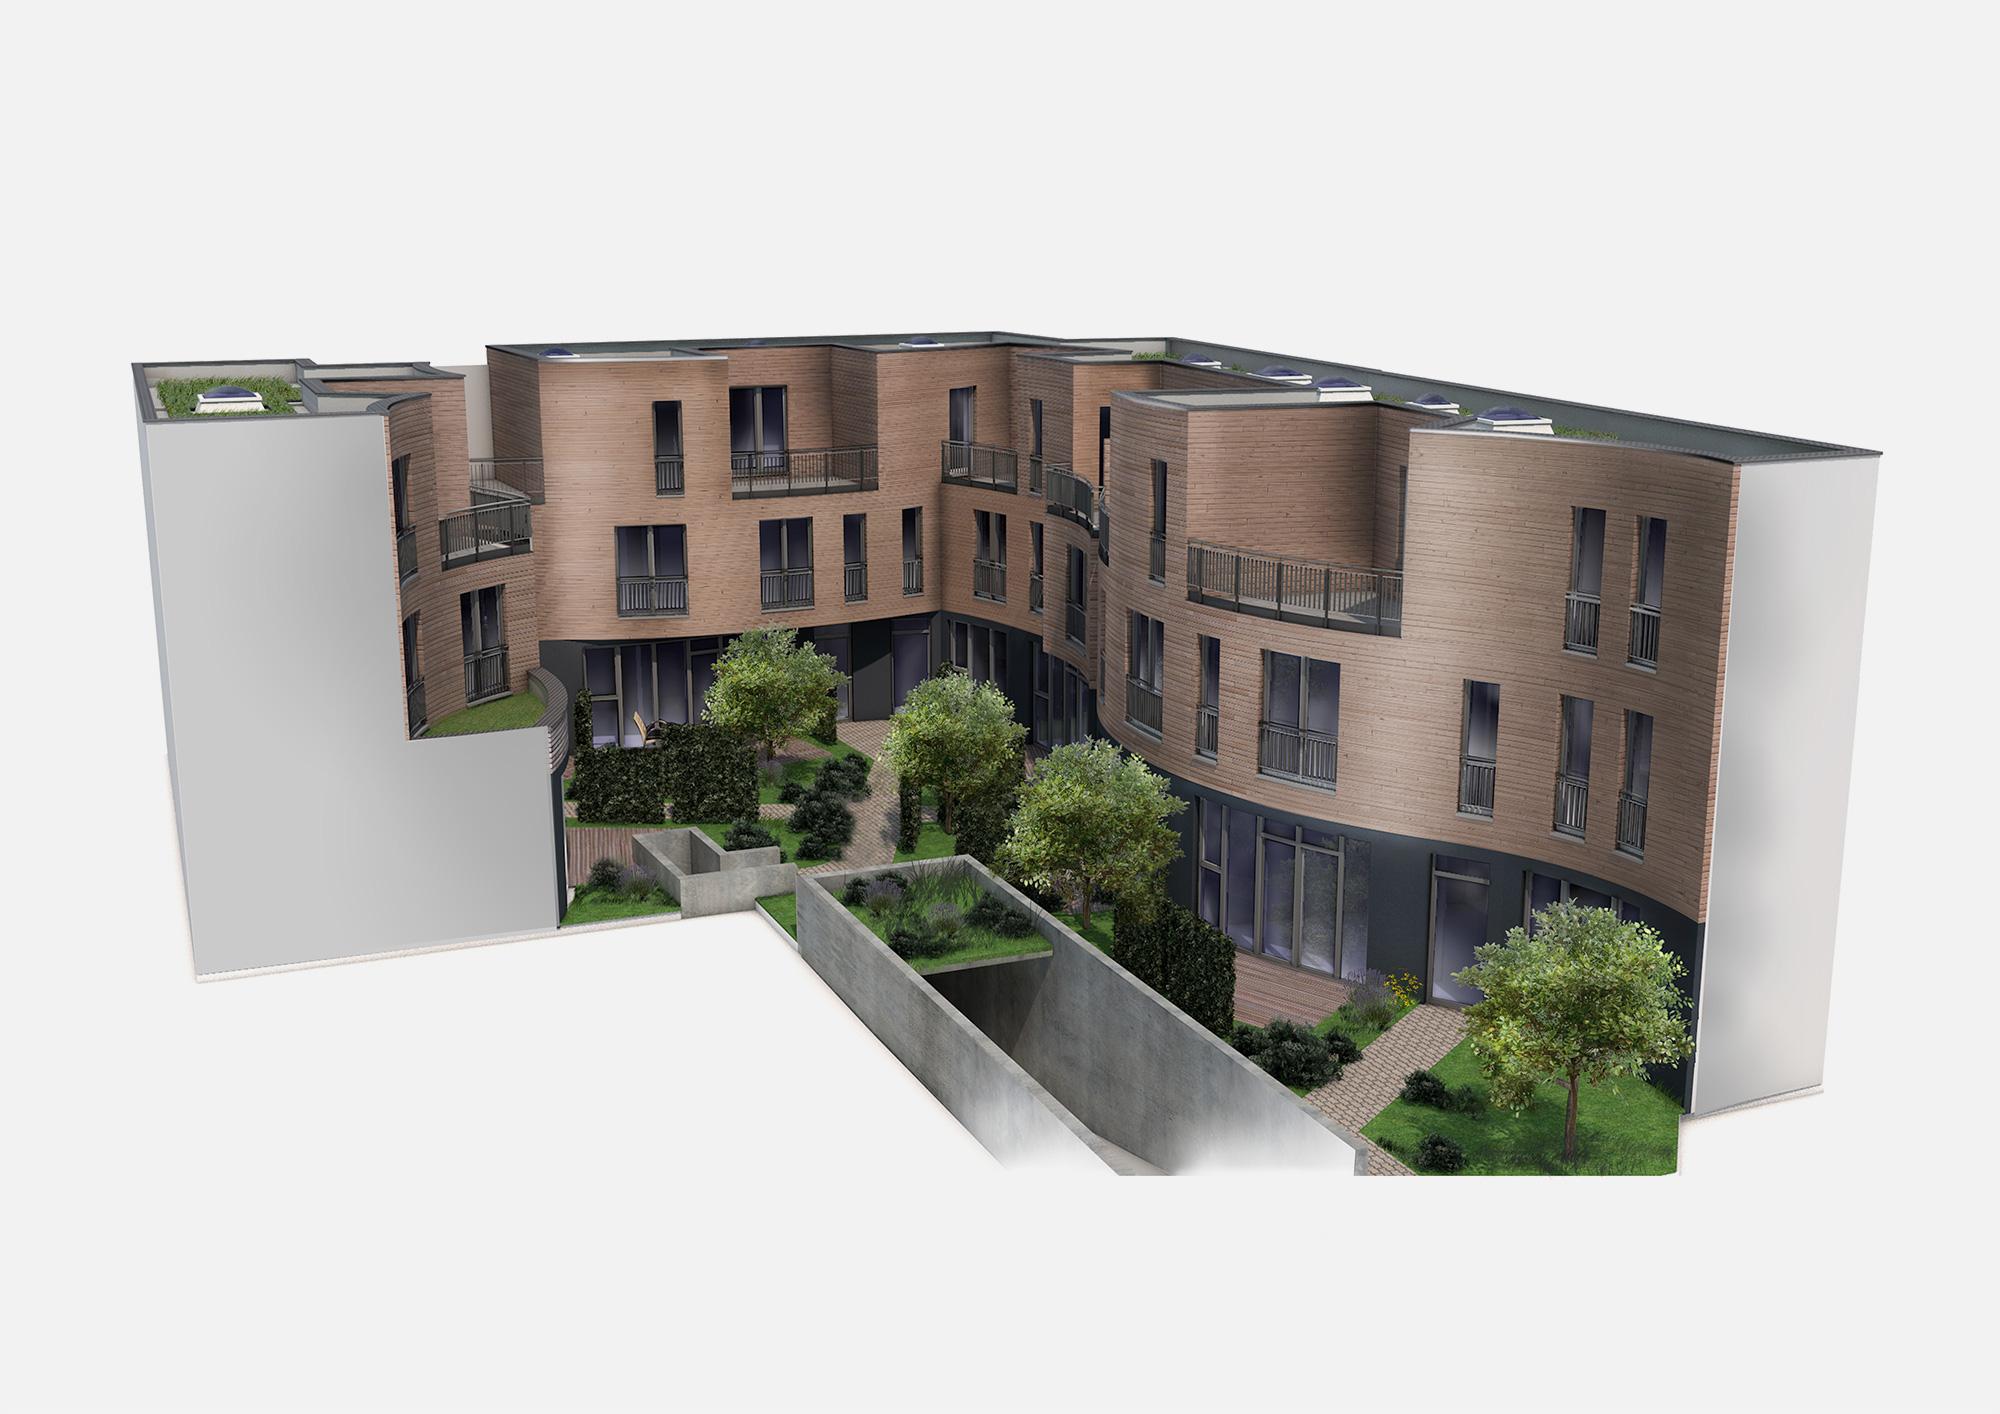 heckundschmiegel-projekte-aderstrasse-perspektive